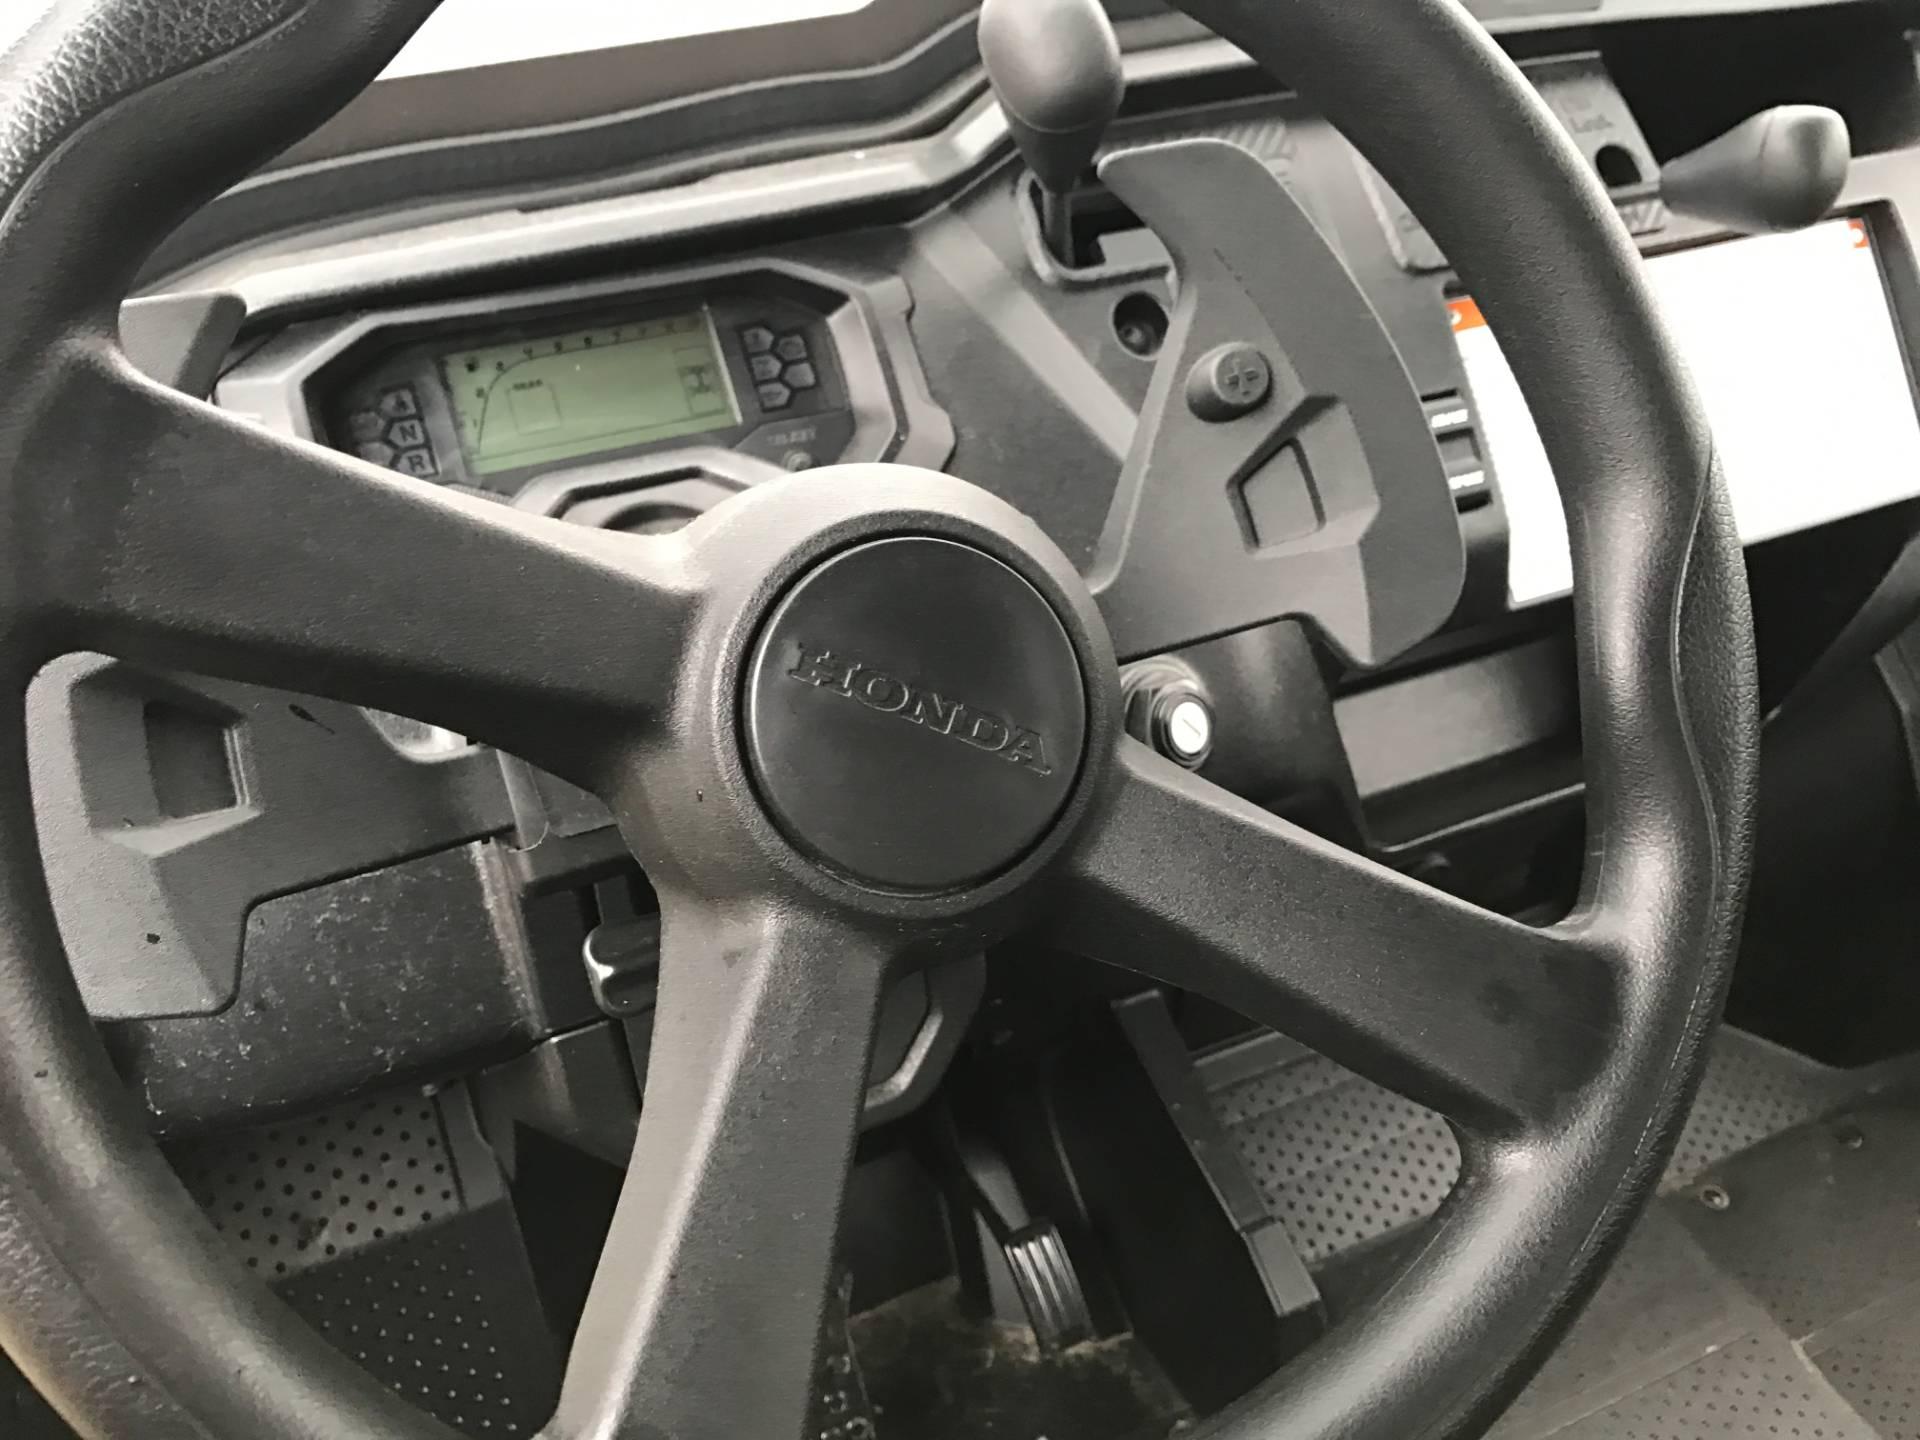 2016 Honda Pioneer 1000-5 Deluxe in Greenville, North Carolina